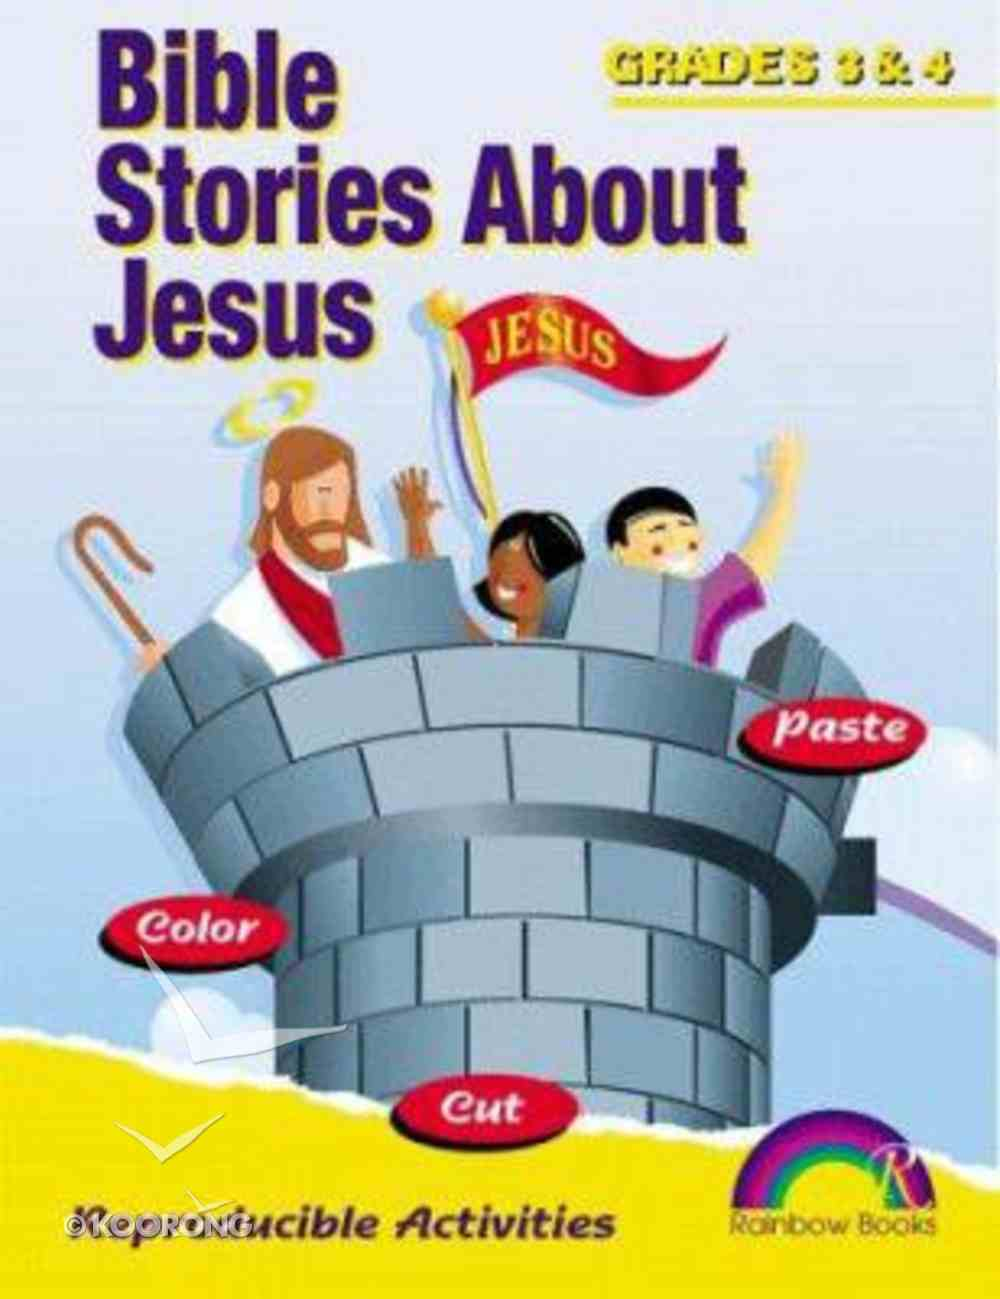 Bible Stories About Jesus: Grades 3&4 (Reproducible) Paperback